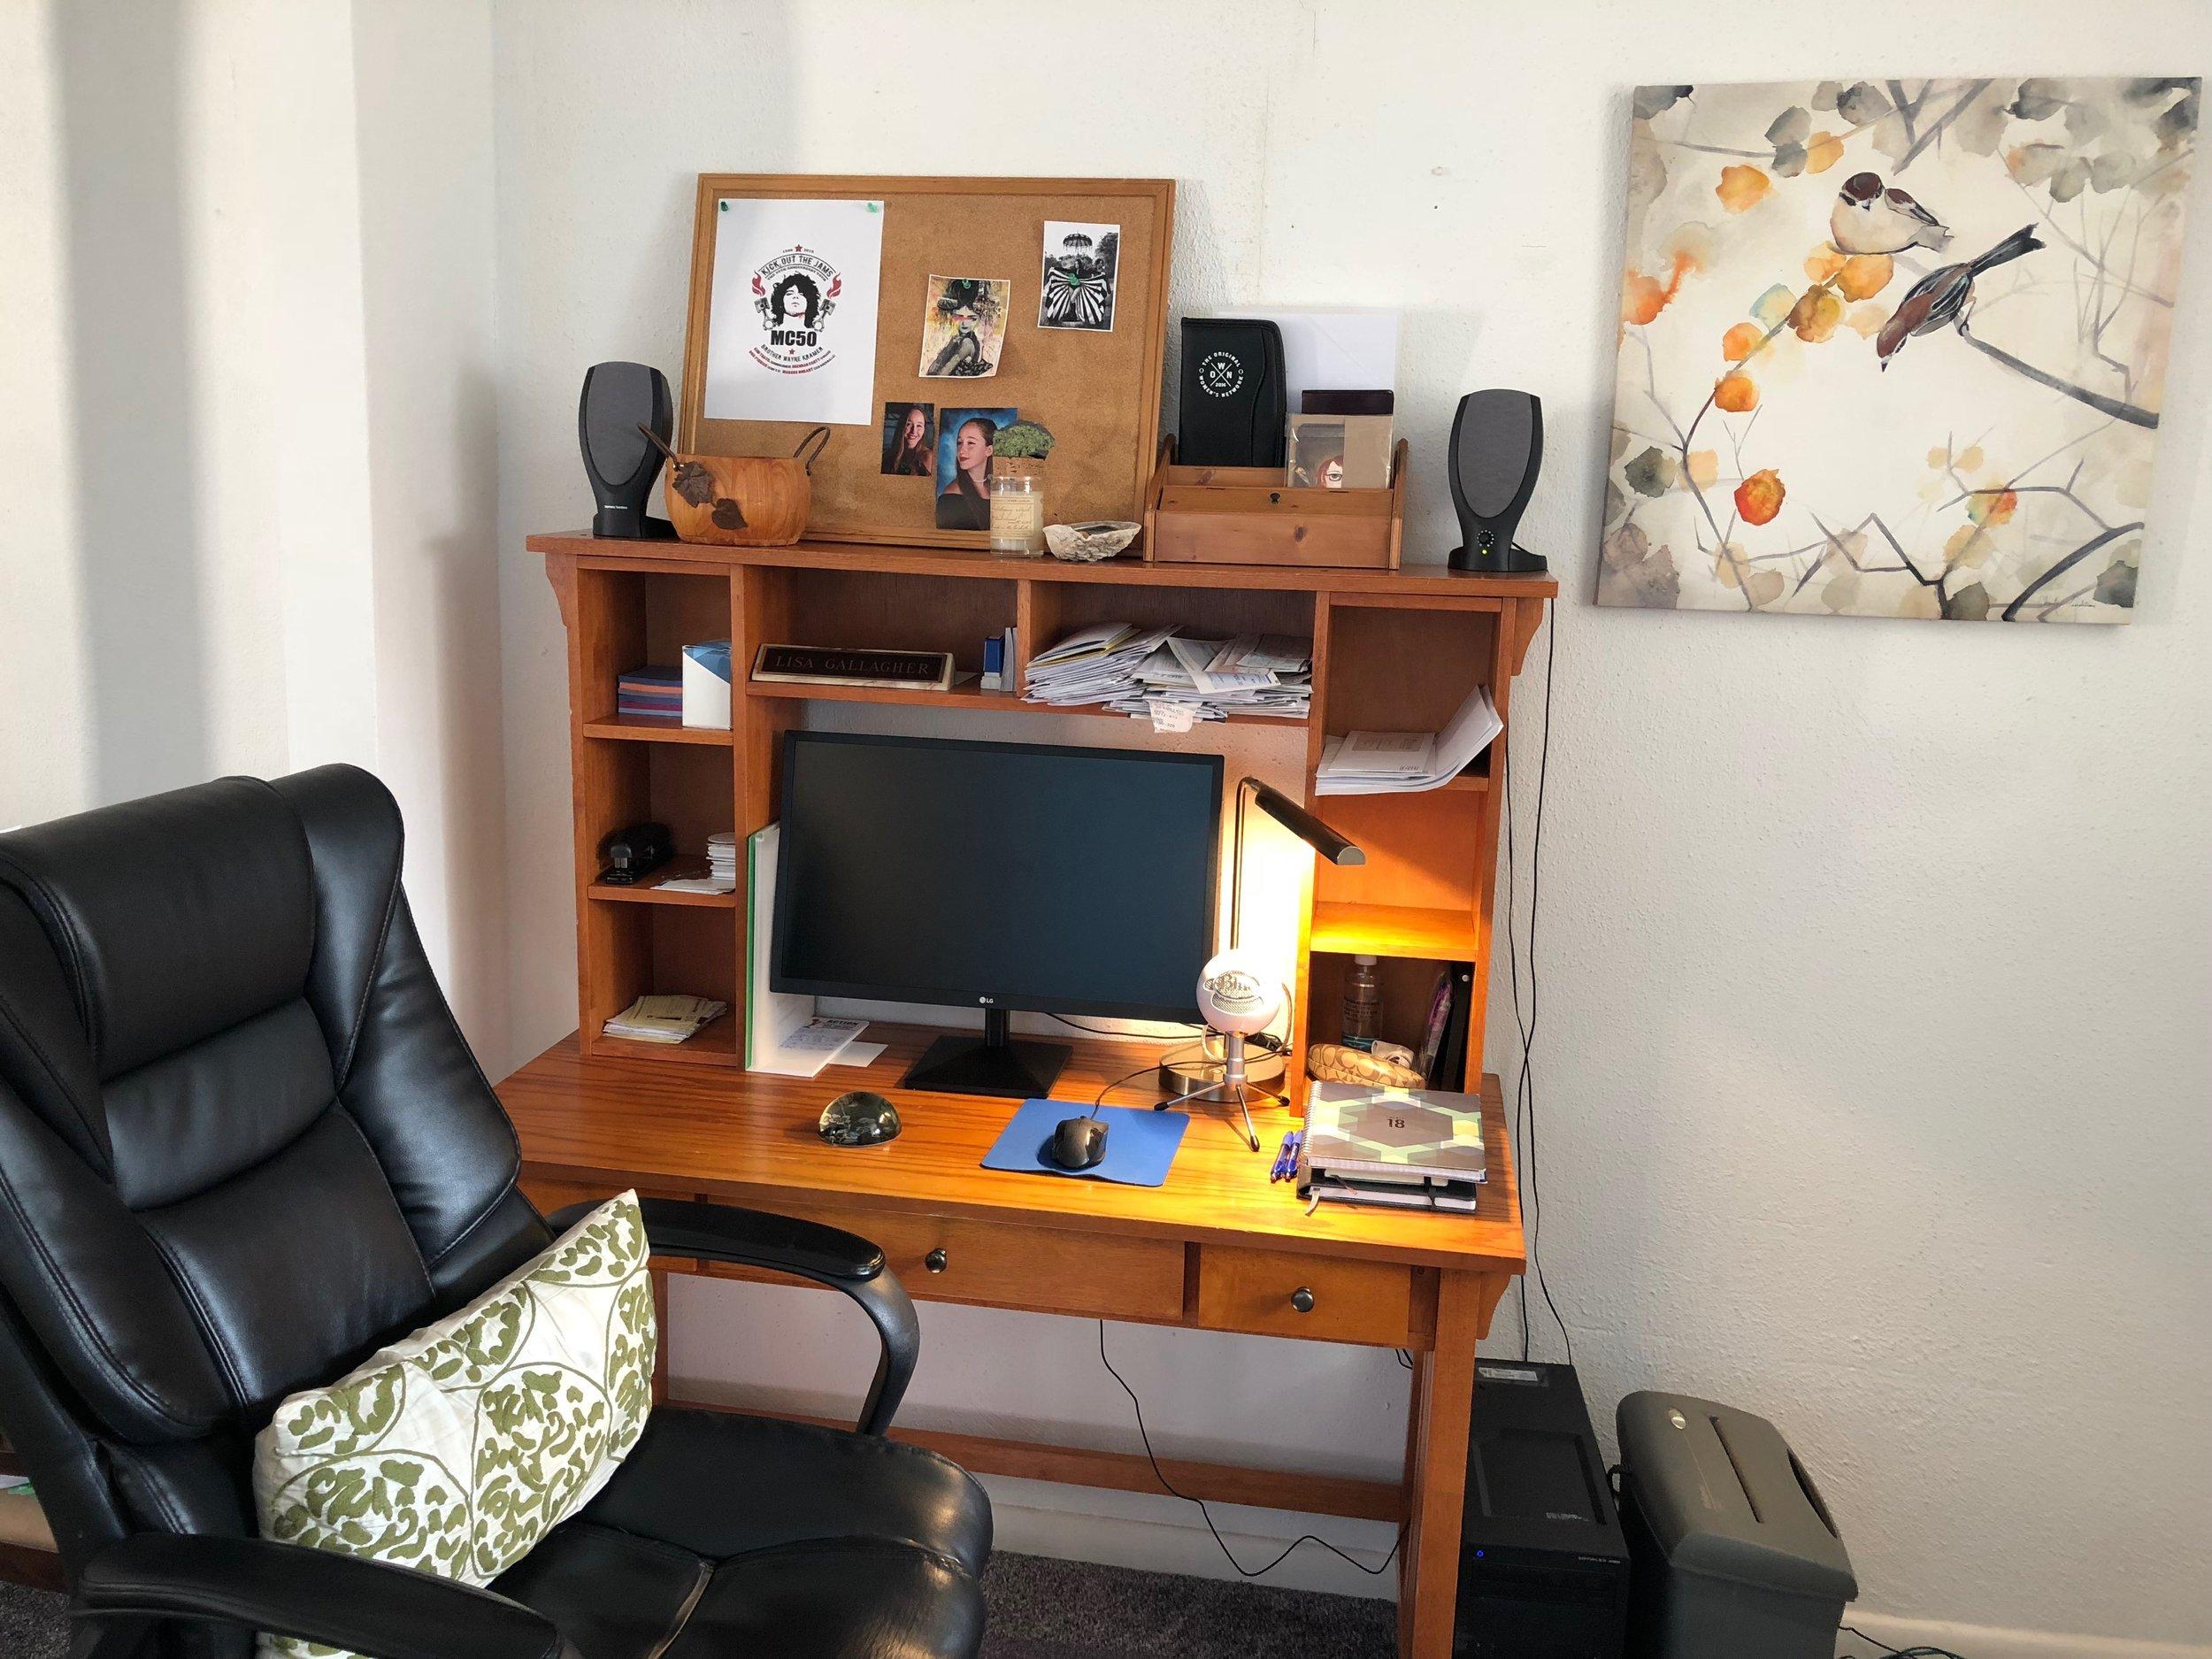 Lisa Ann favors modern design with warm appeal, like the brass light fixture on her desk.